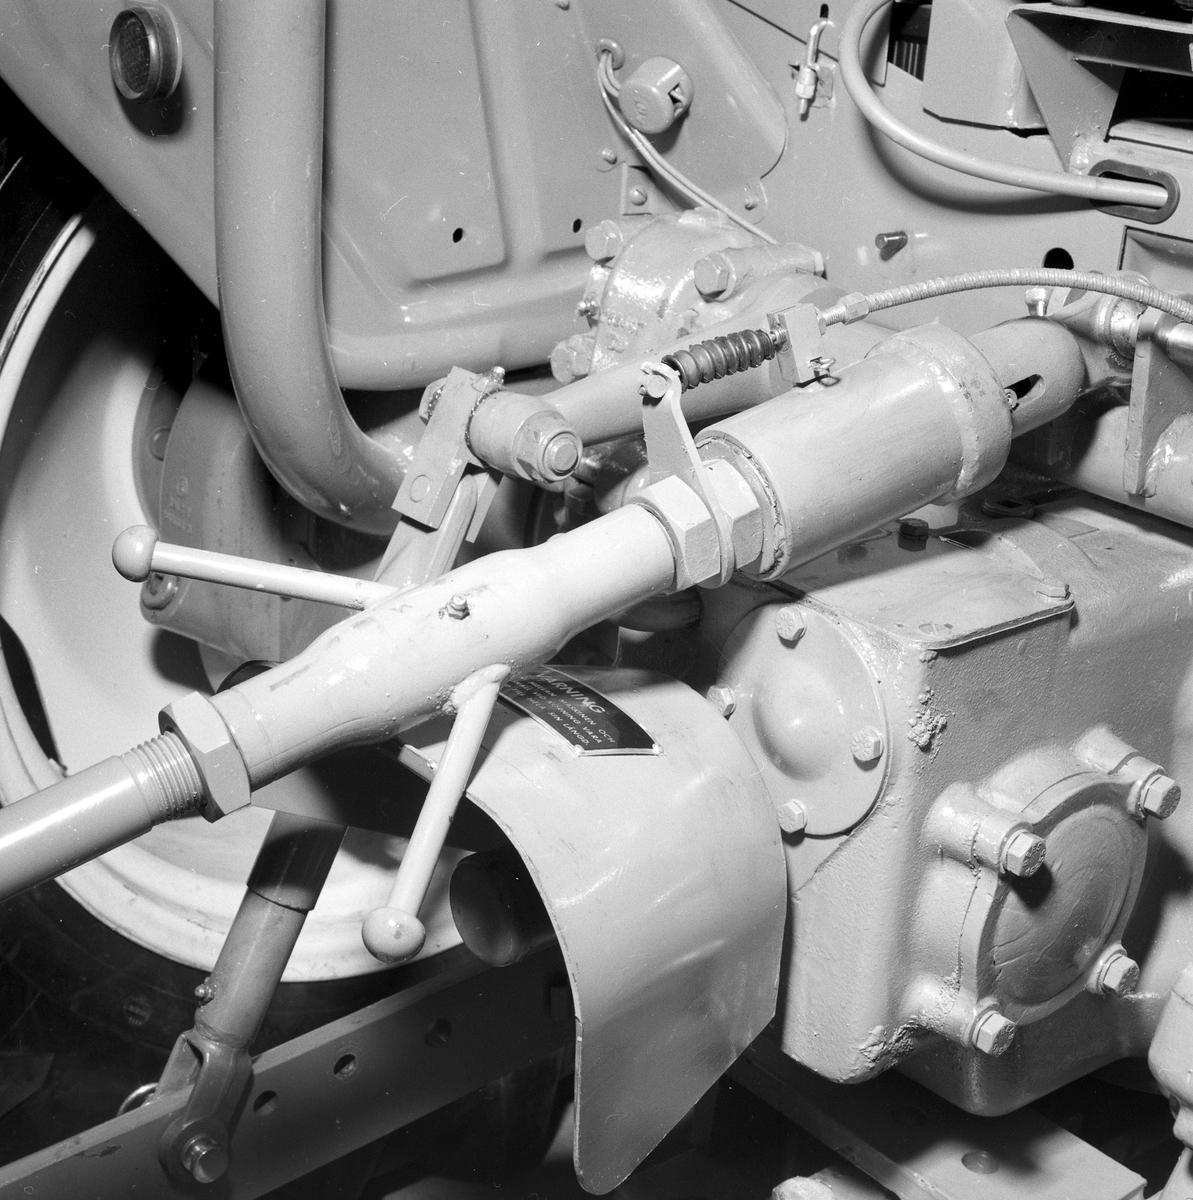 Lantbruksmaskiner hos AB Westeråsmaskiner, Morgongåva, Uppland, maj 1961